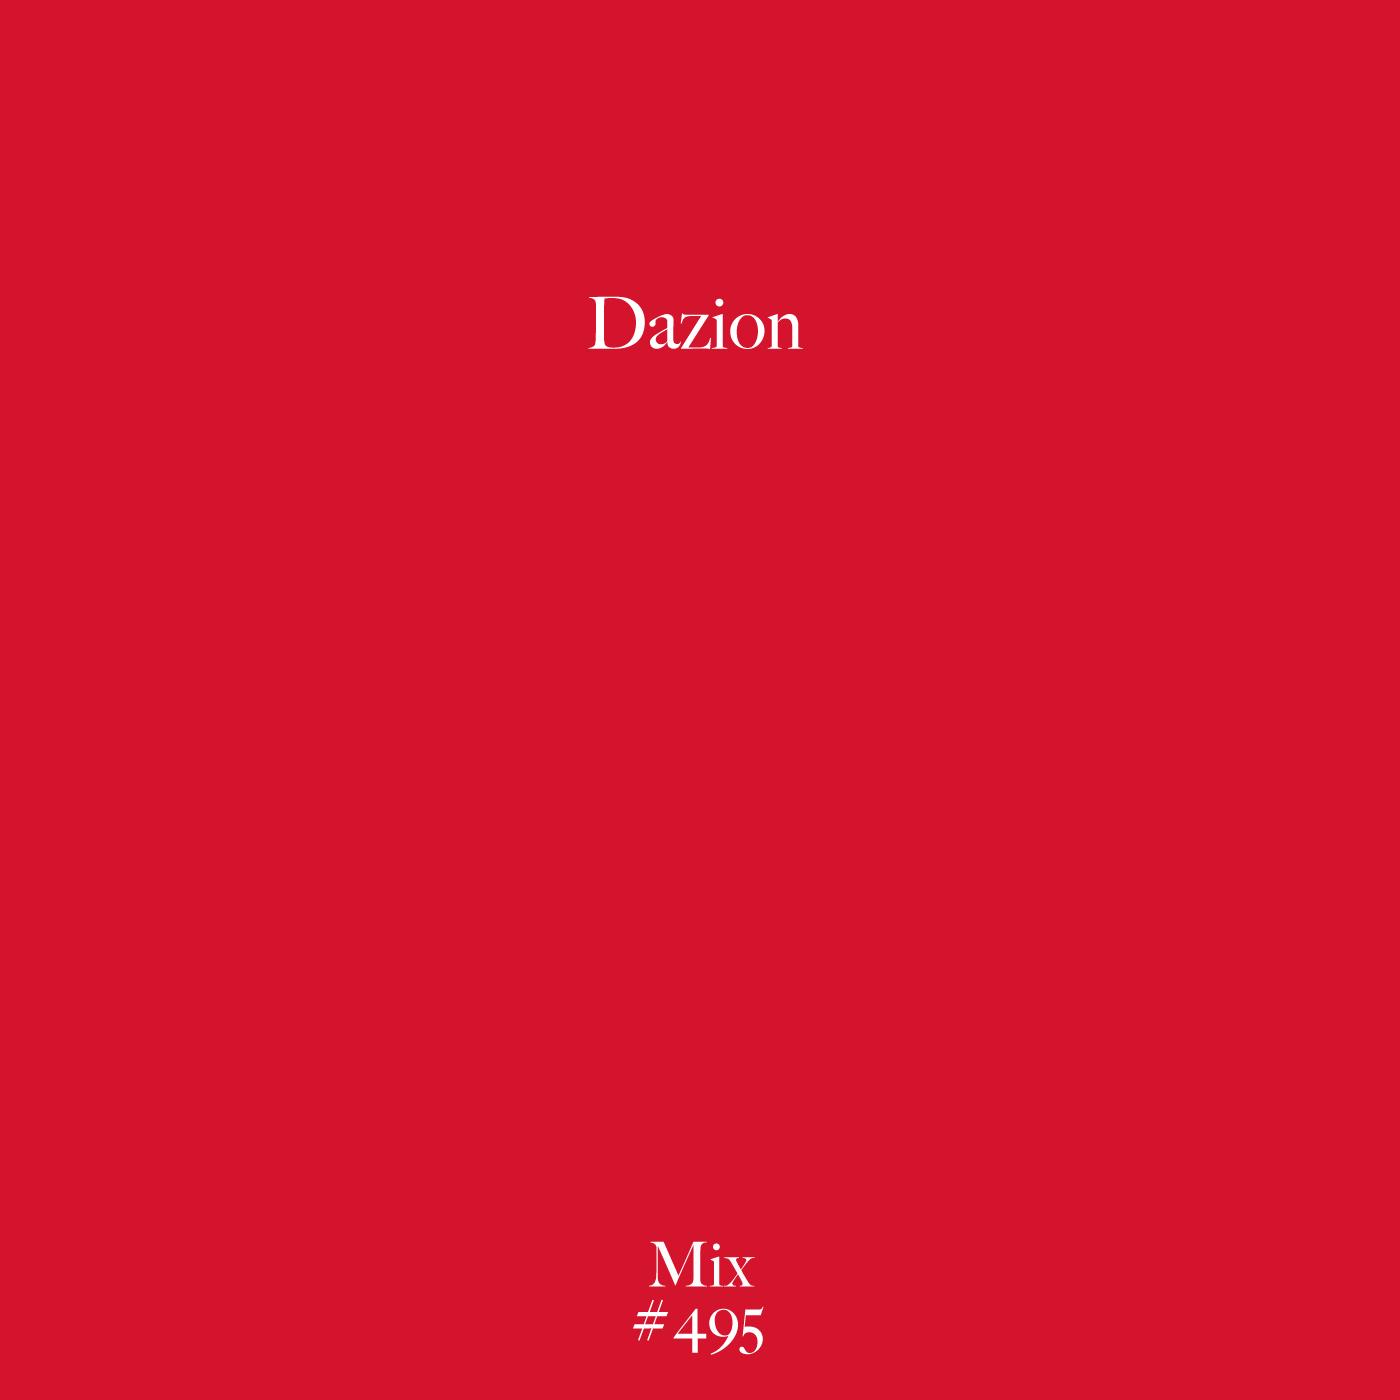 Dazion, mix. Test Pressing